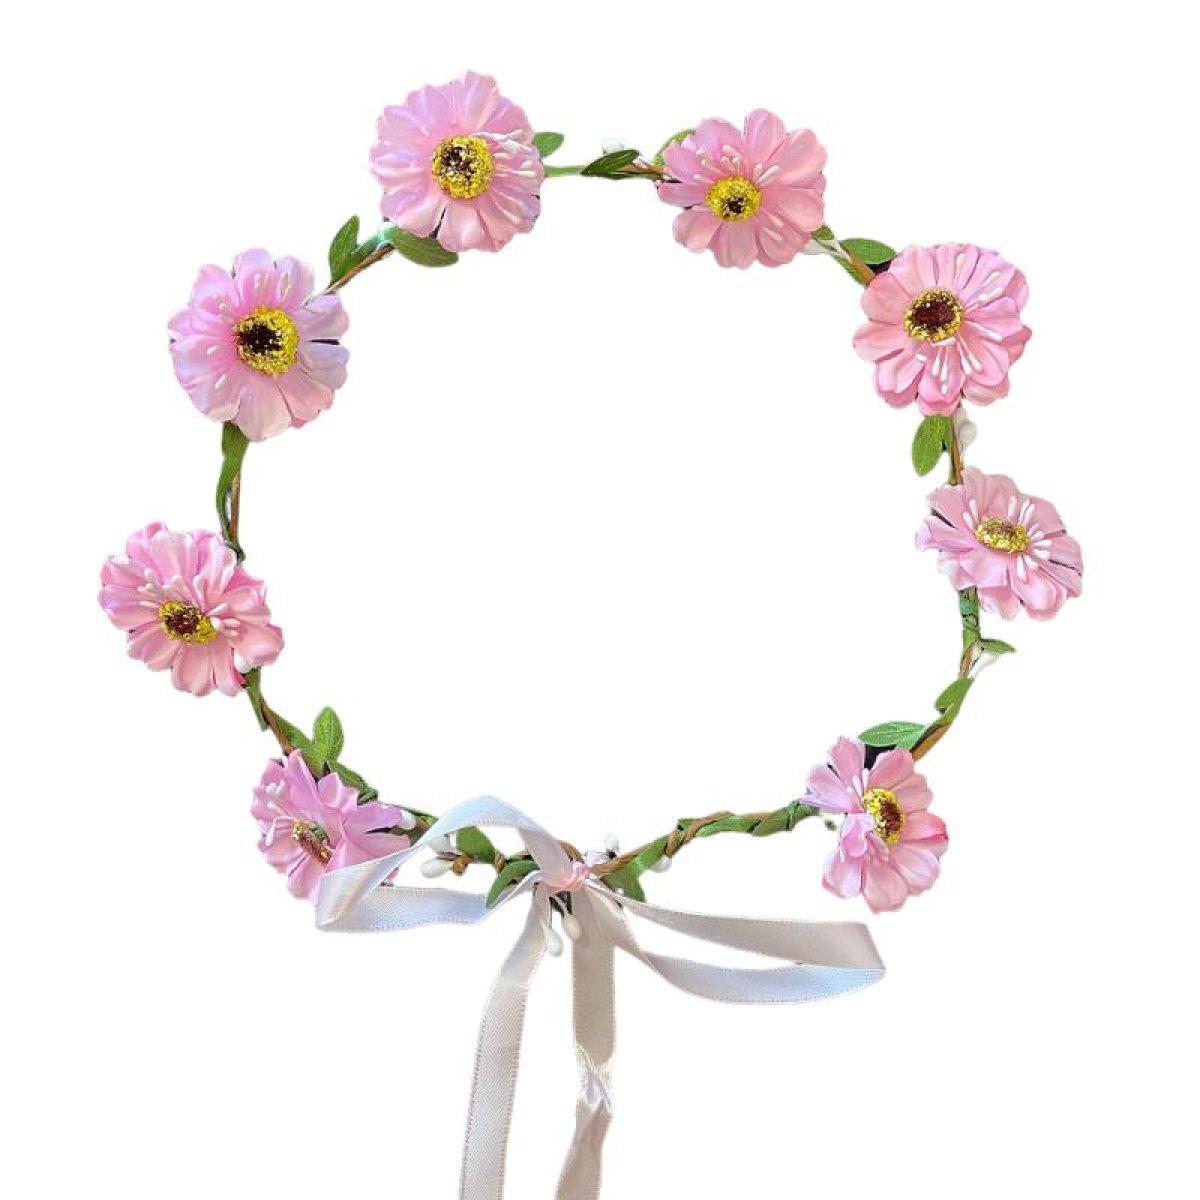 Blomsterkrans Hårbånd